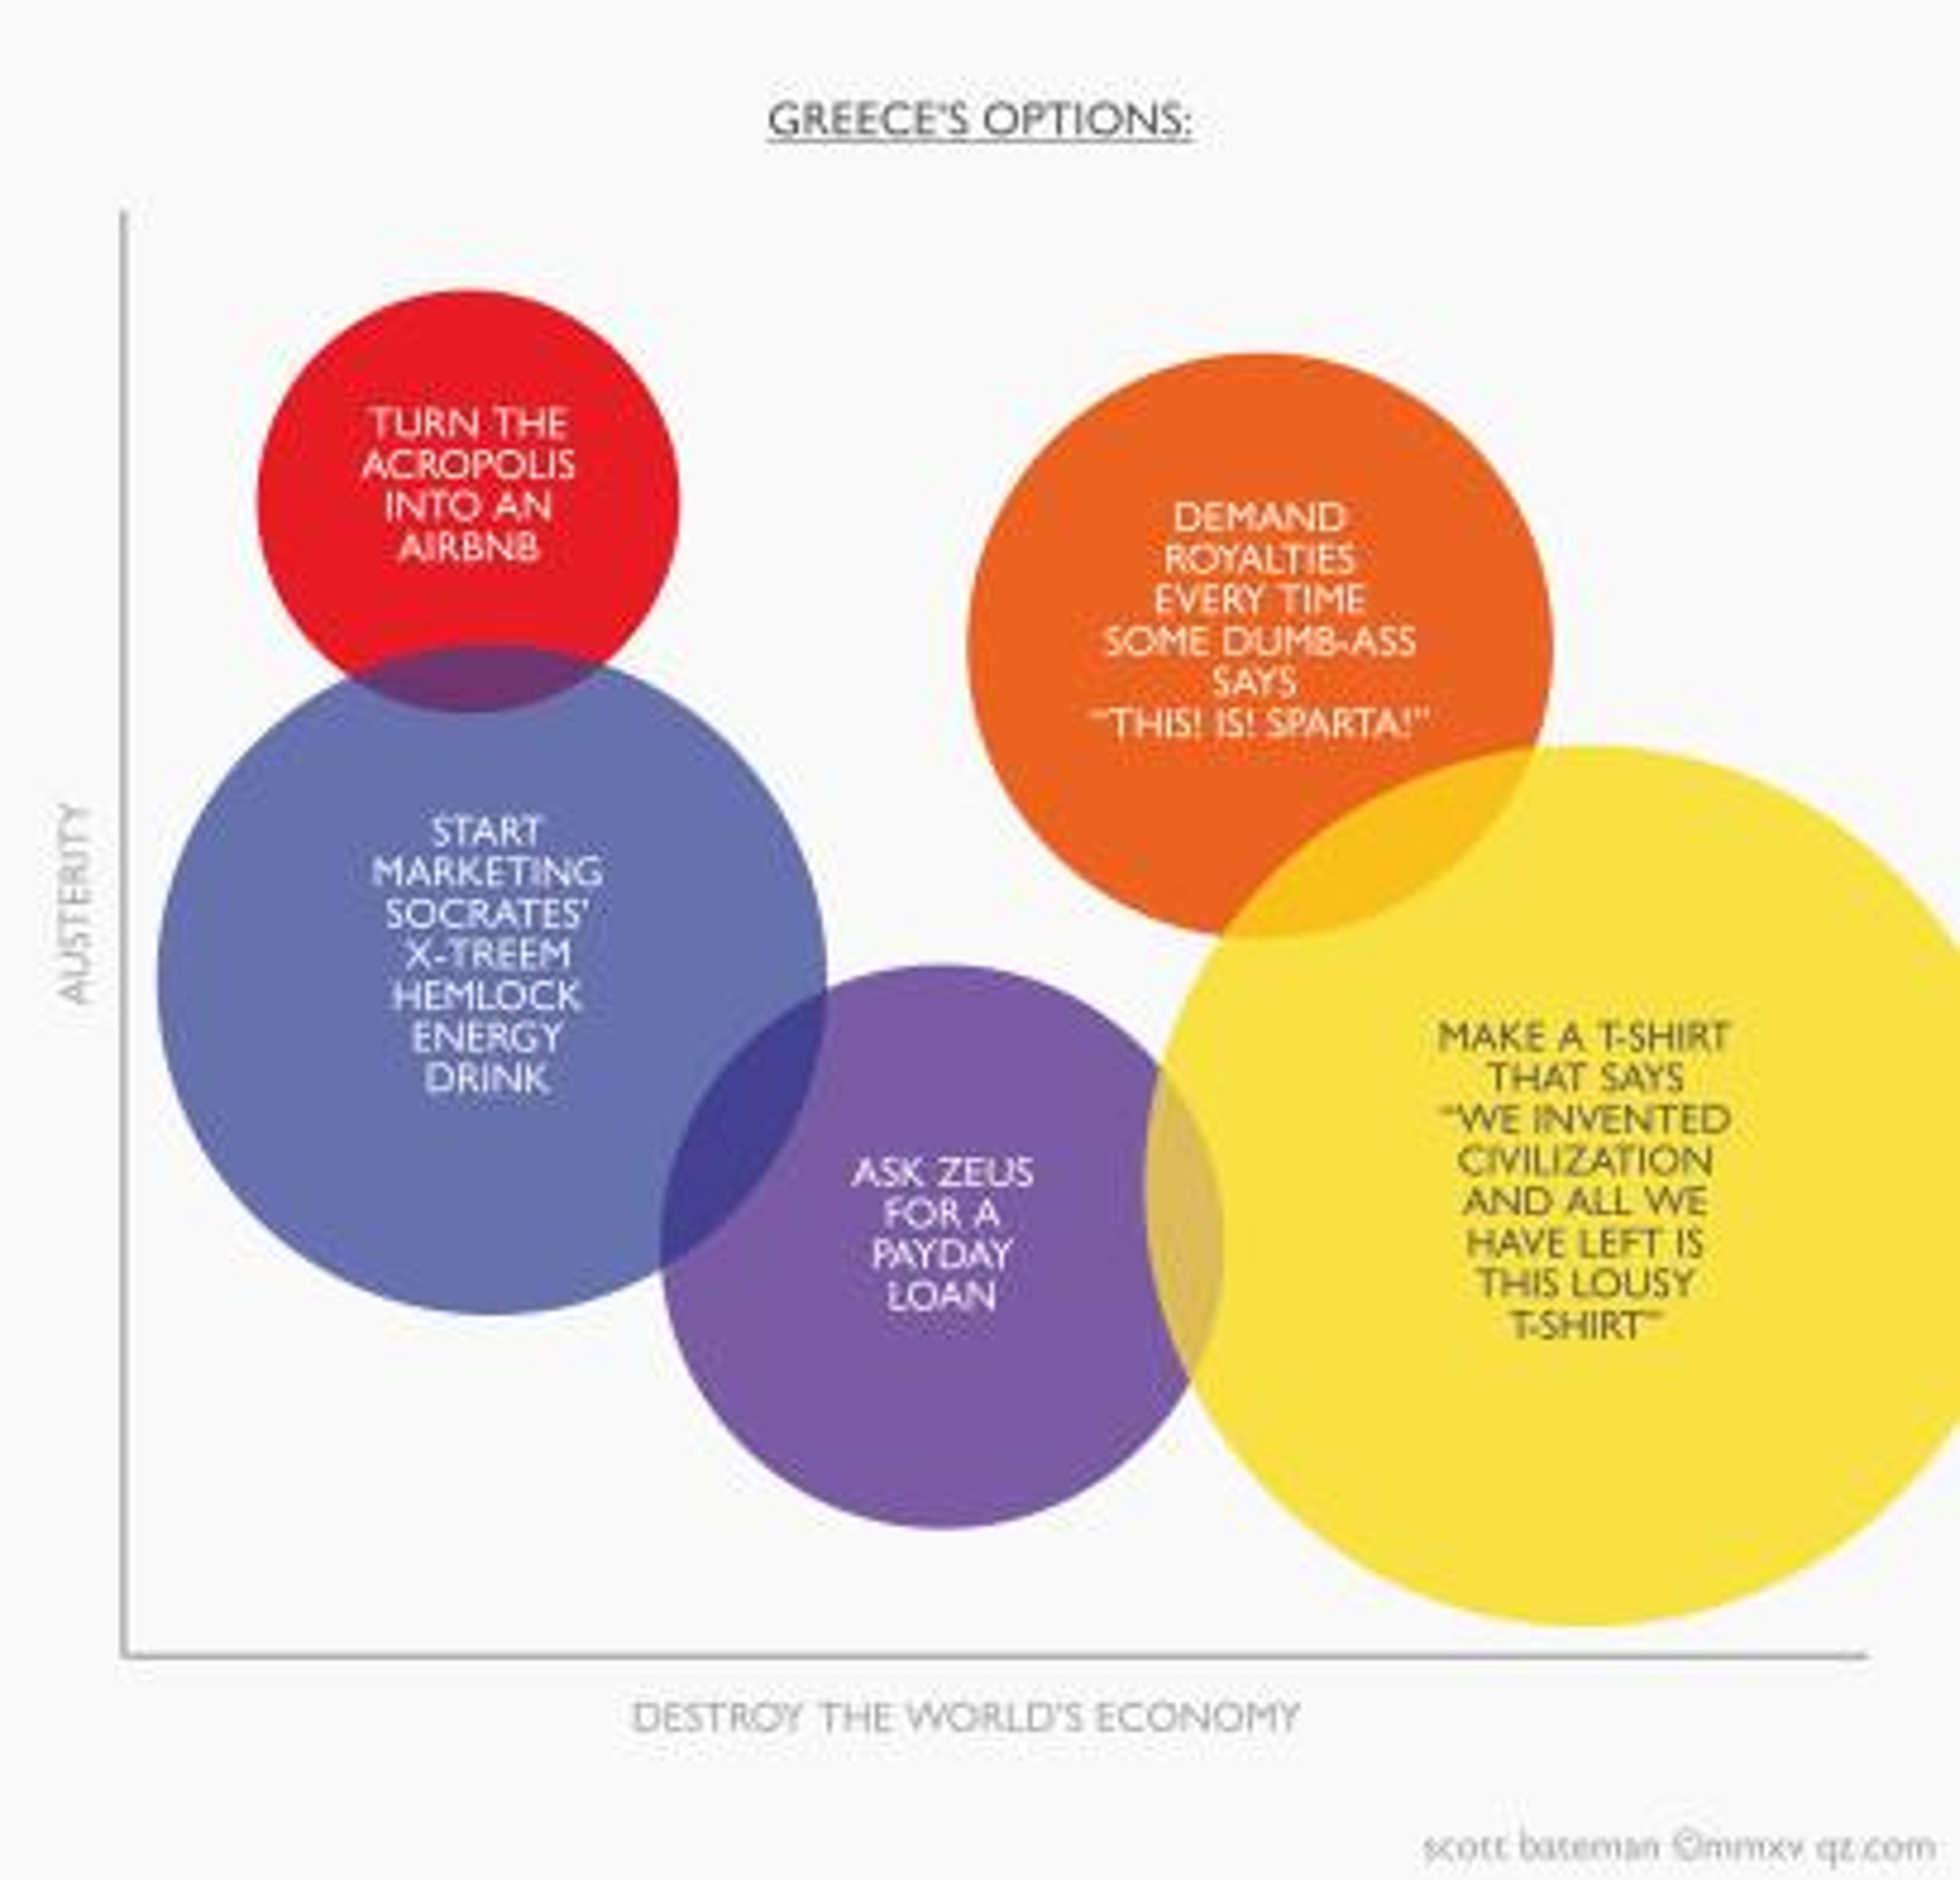 Greece's options humorous chart